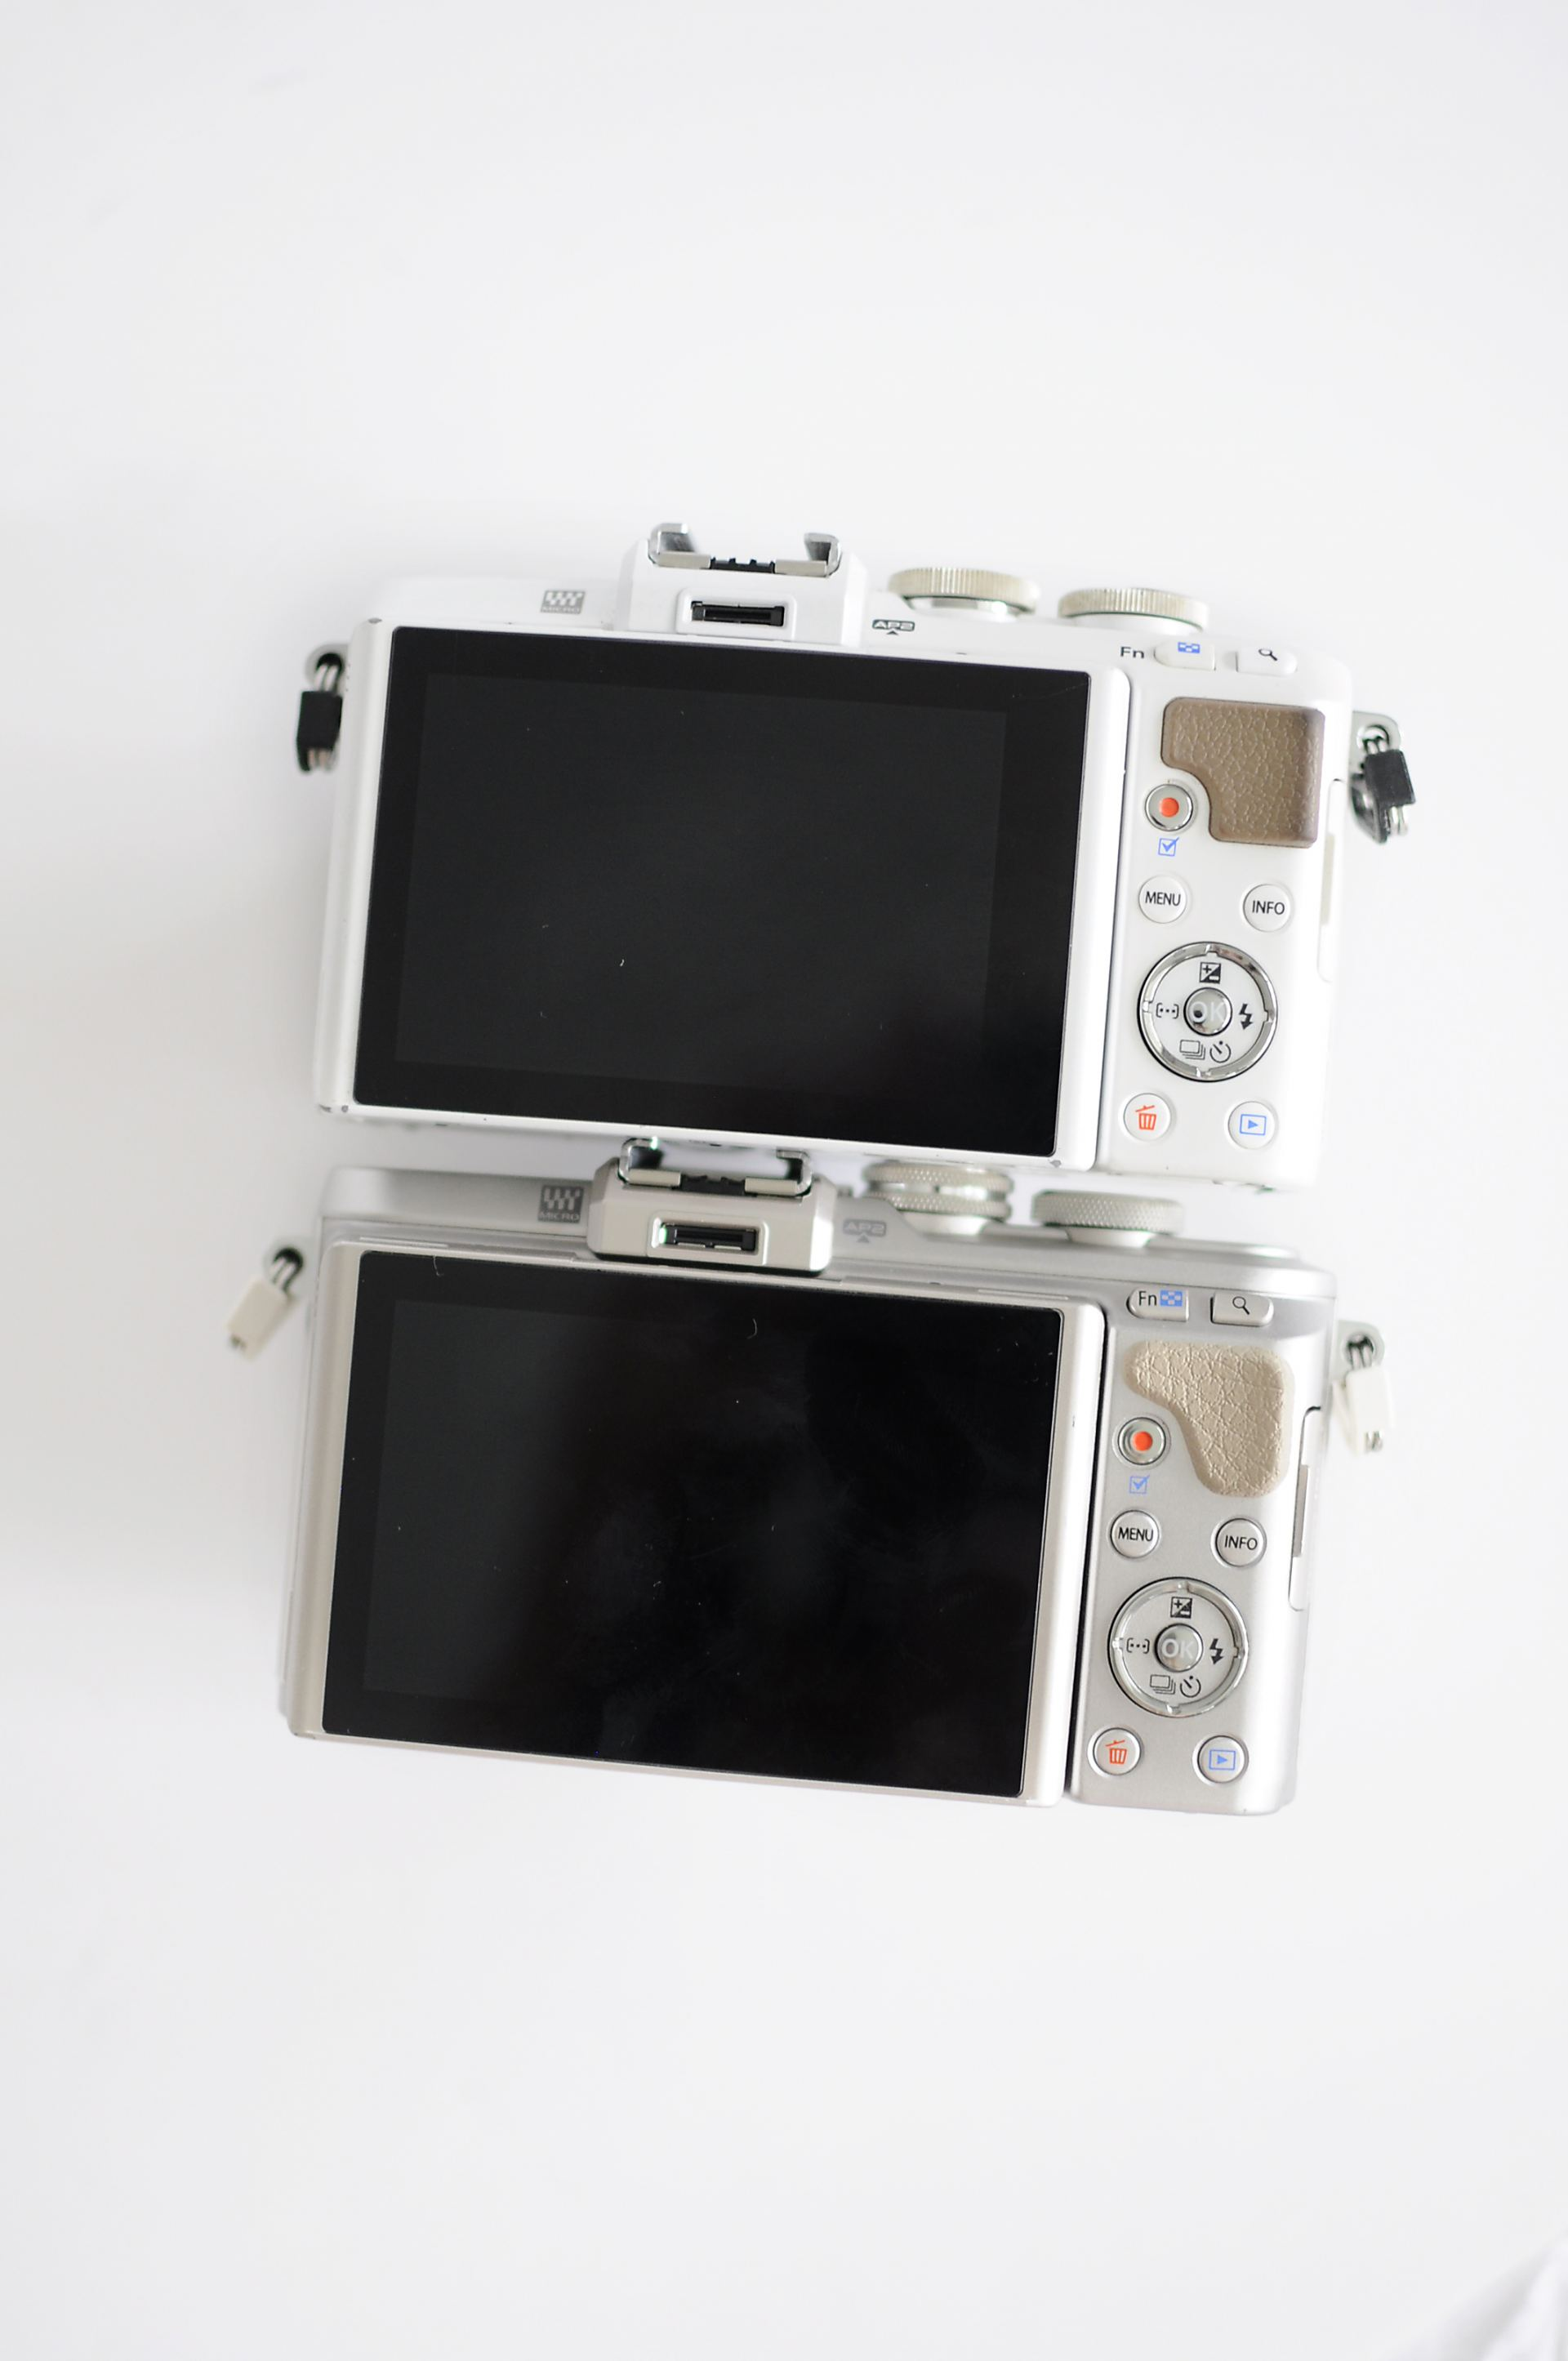 olympus pen epl7 vs epl8 camera review